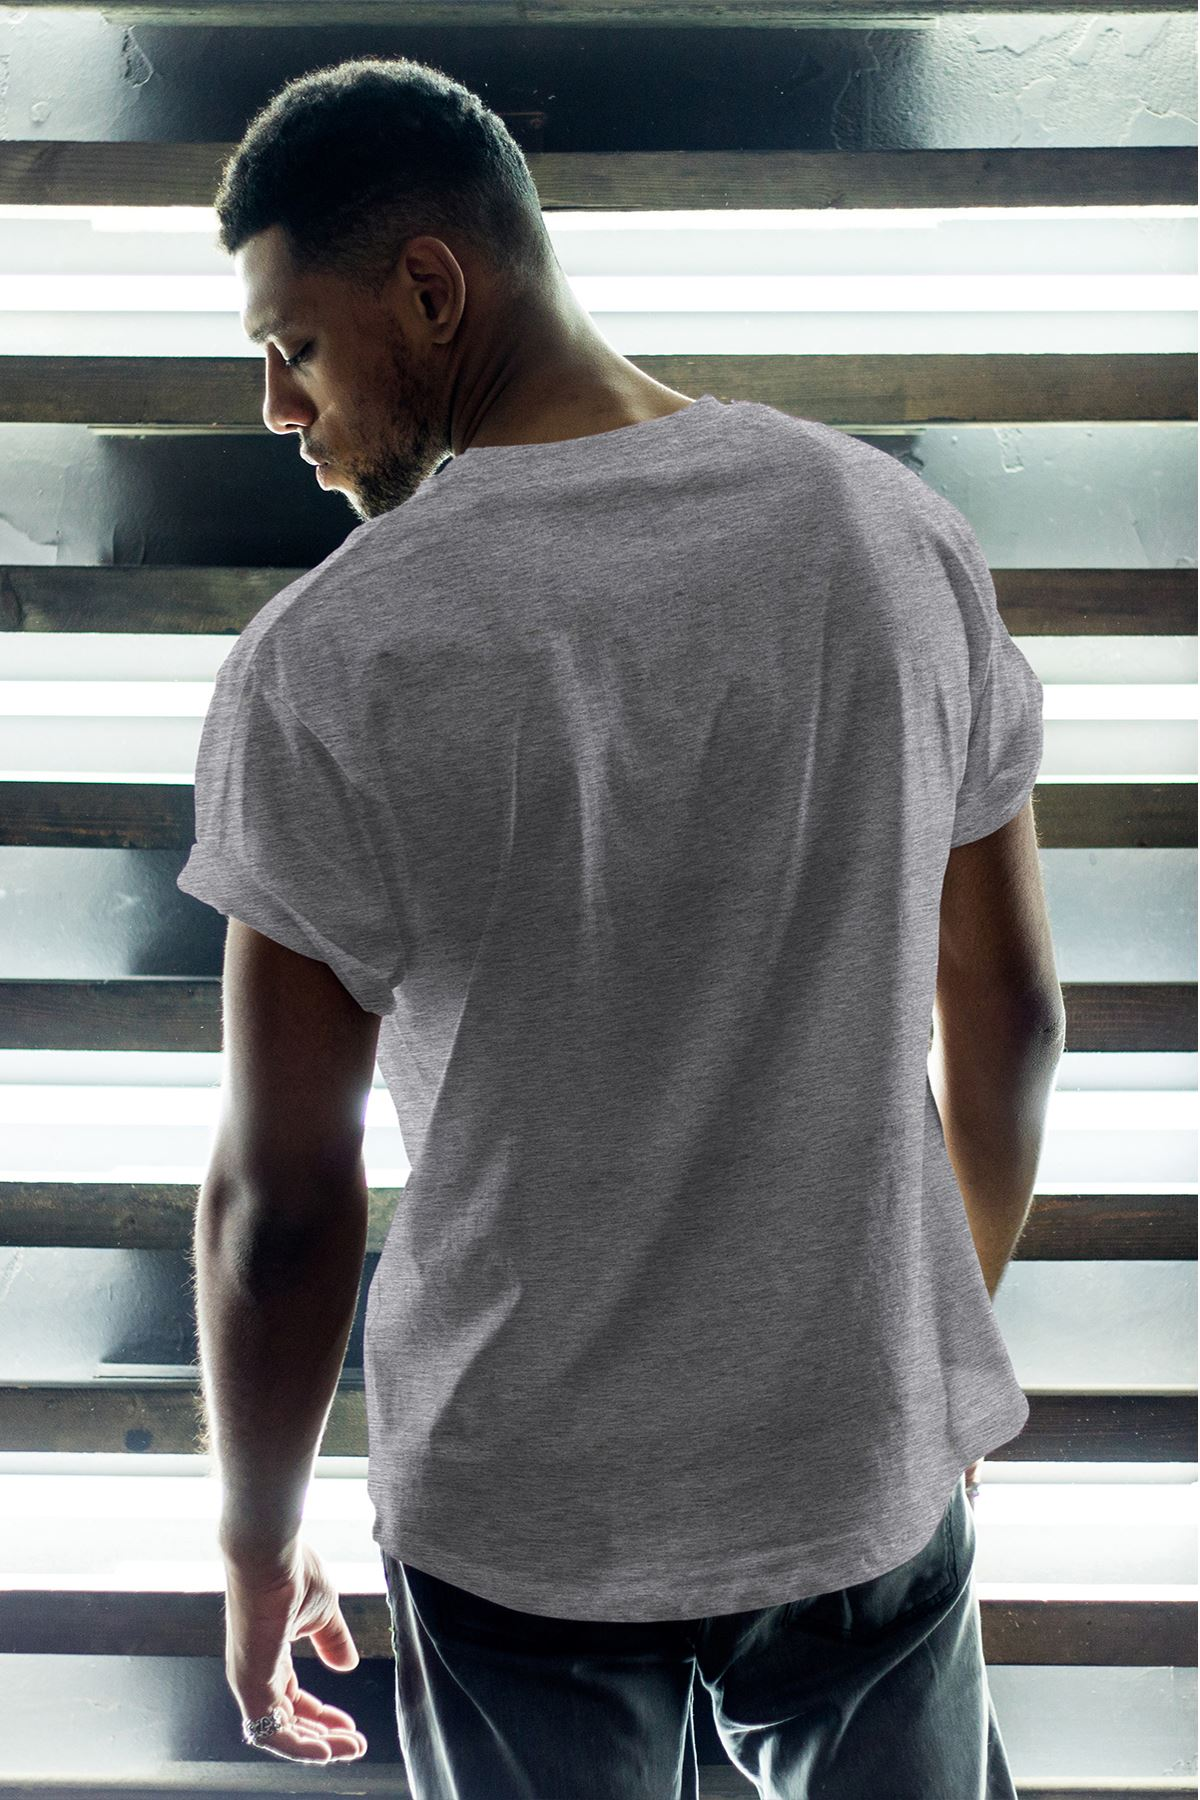 Anime Death Note 06 Gri Erkek Oversize Tshirt - Tişört